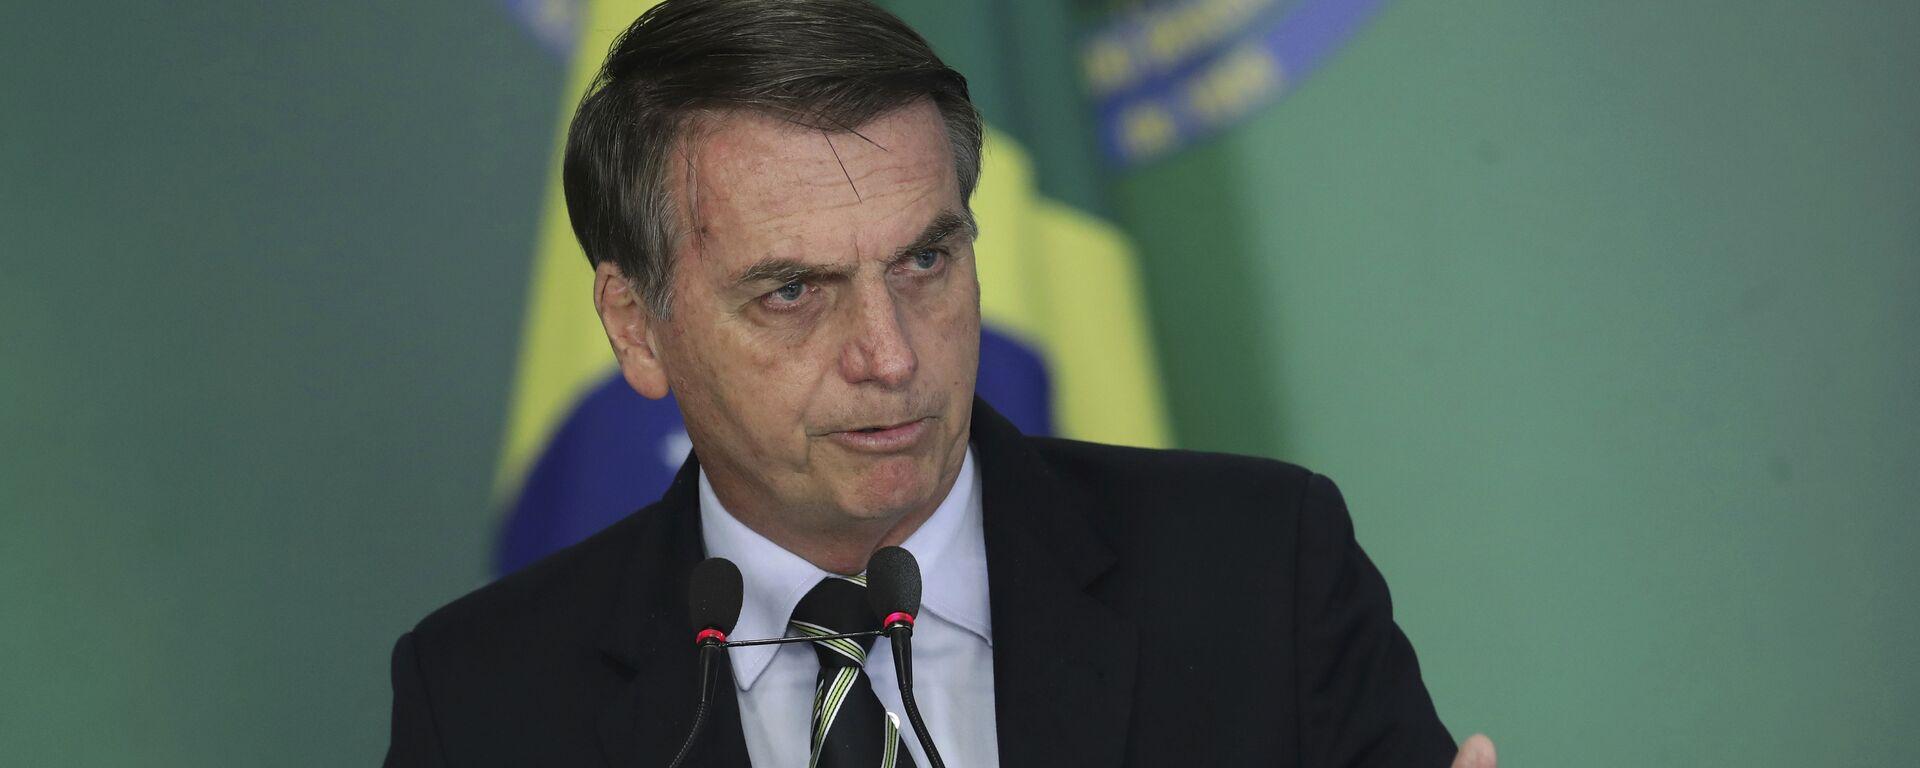 Jair Bolsonaro, presidente de Brasil - Sputnik Mundo, 1920, 09.08.2021